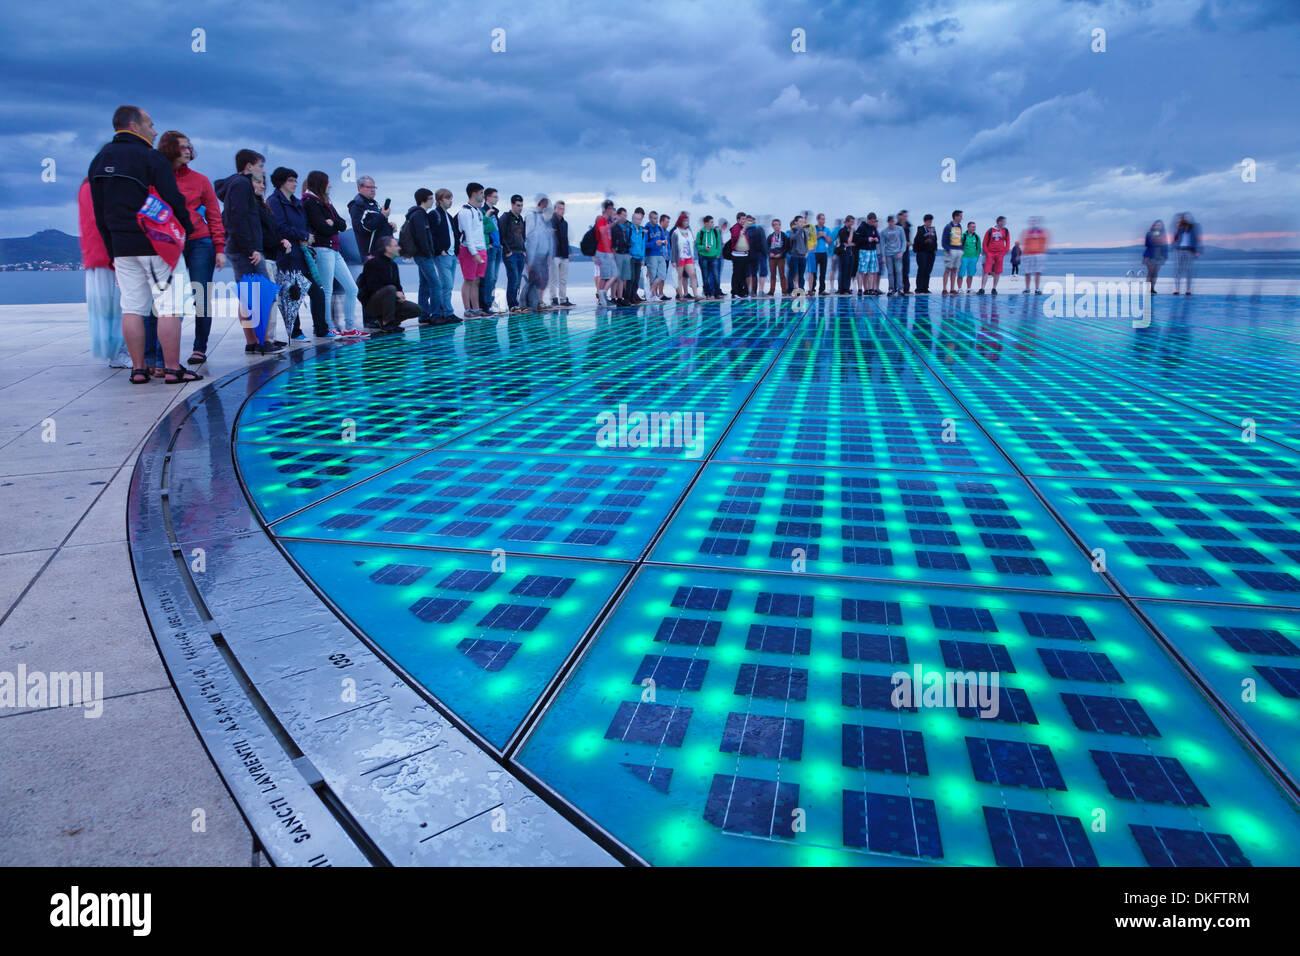 Installation Greetings To The Sun by Nikola Basic at dusk, Zadar, Dalmatia, Croatia, Europe - Stock Image